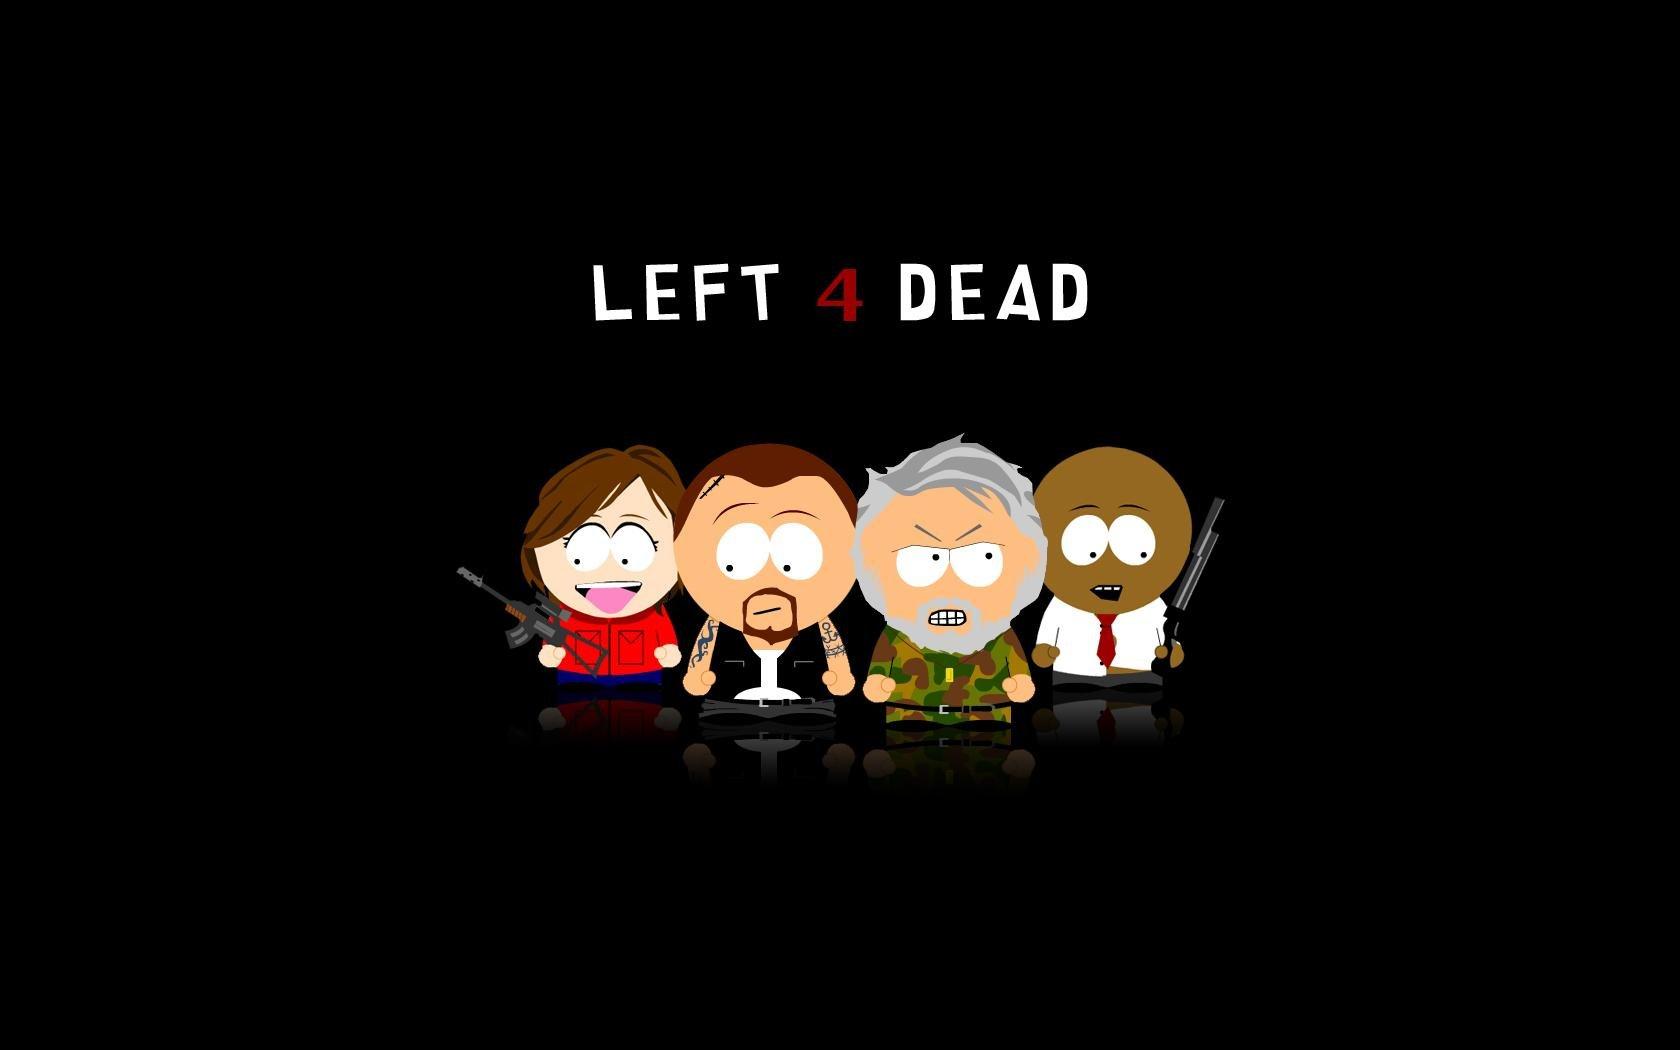 The Walking Dead Logo 2014 Fondo De Pantalla Fondos De: South Park Left 4 Dead Crossovers Wallpaper